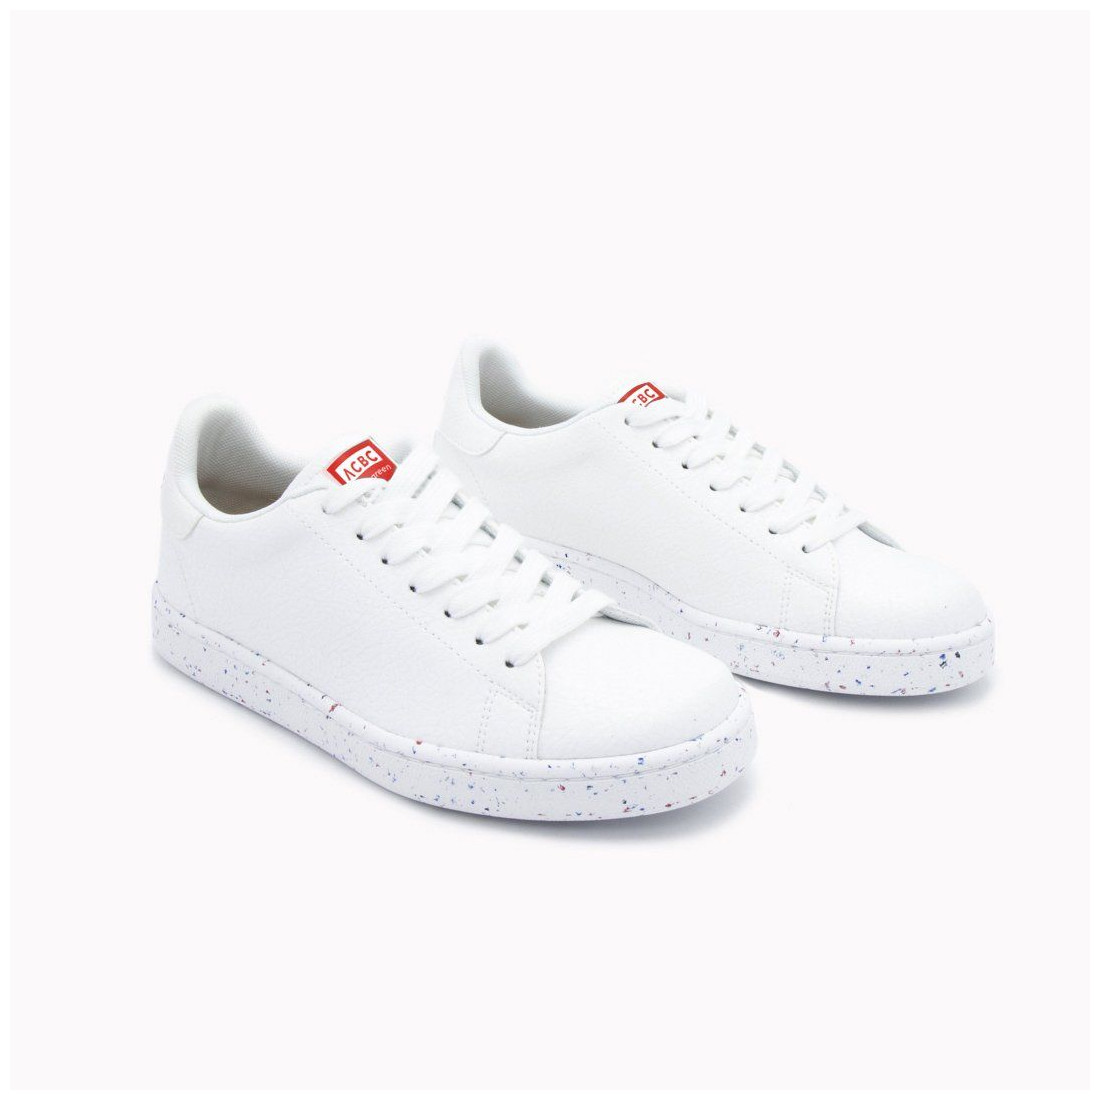 sneakers man acbc shtl eco m205 8703